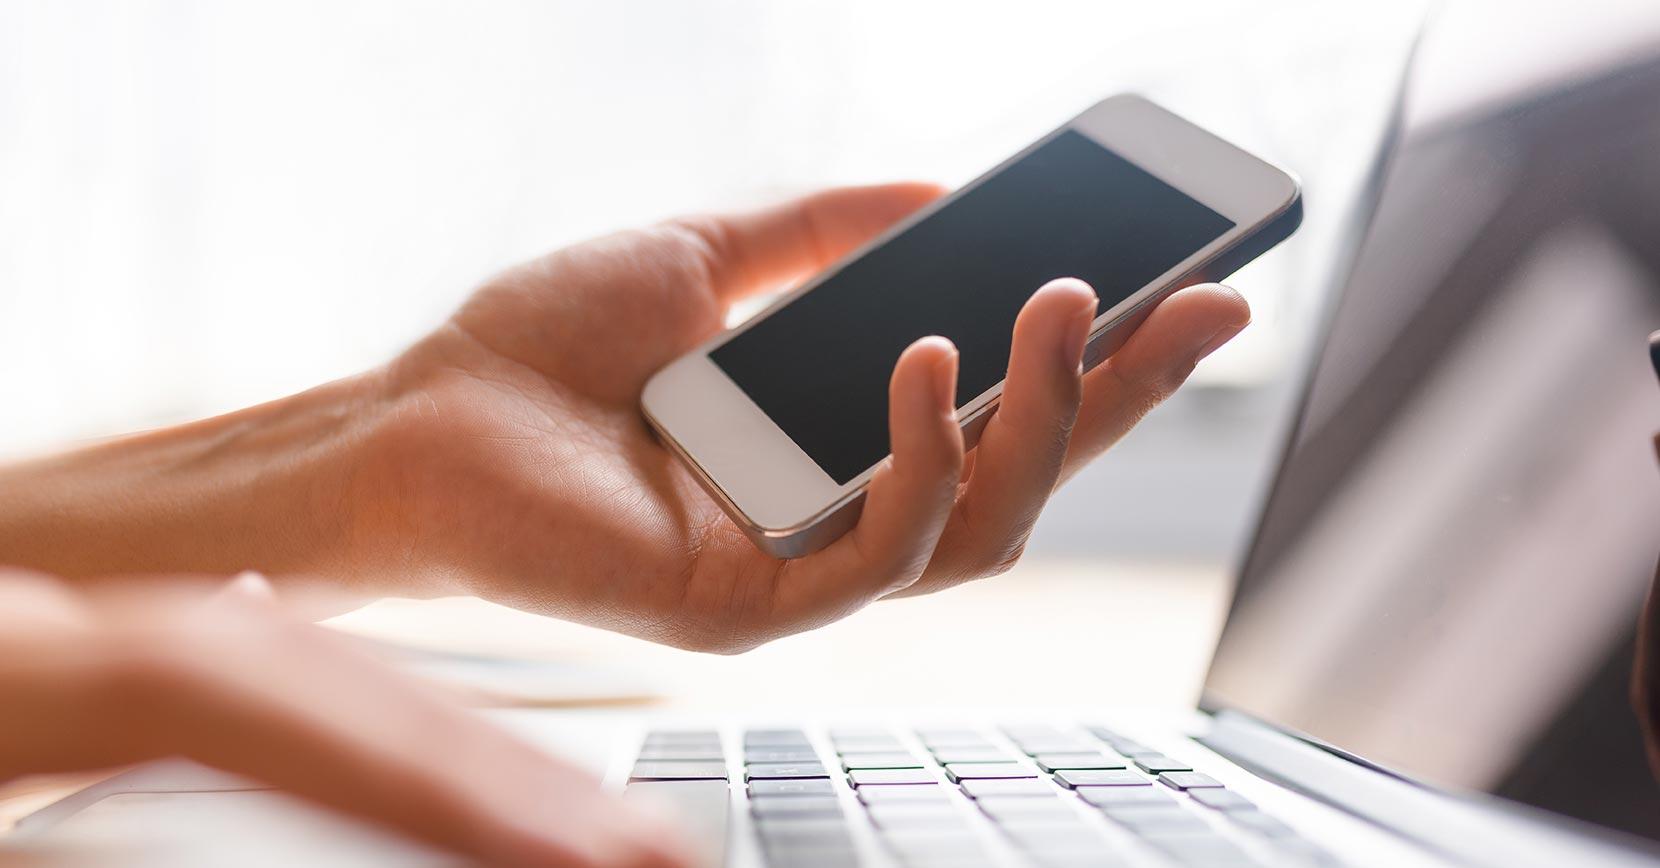 premium mobilabonnement